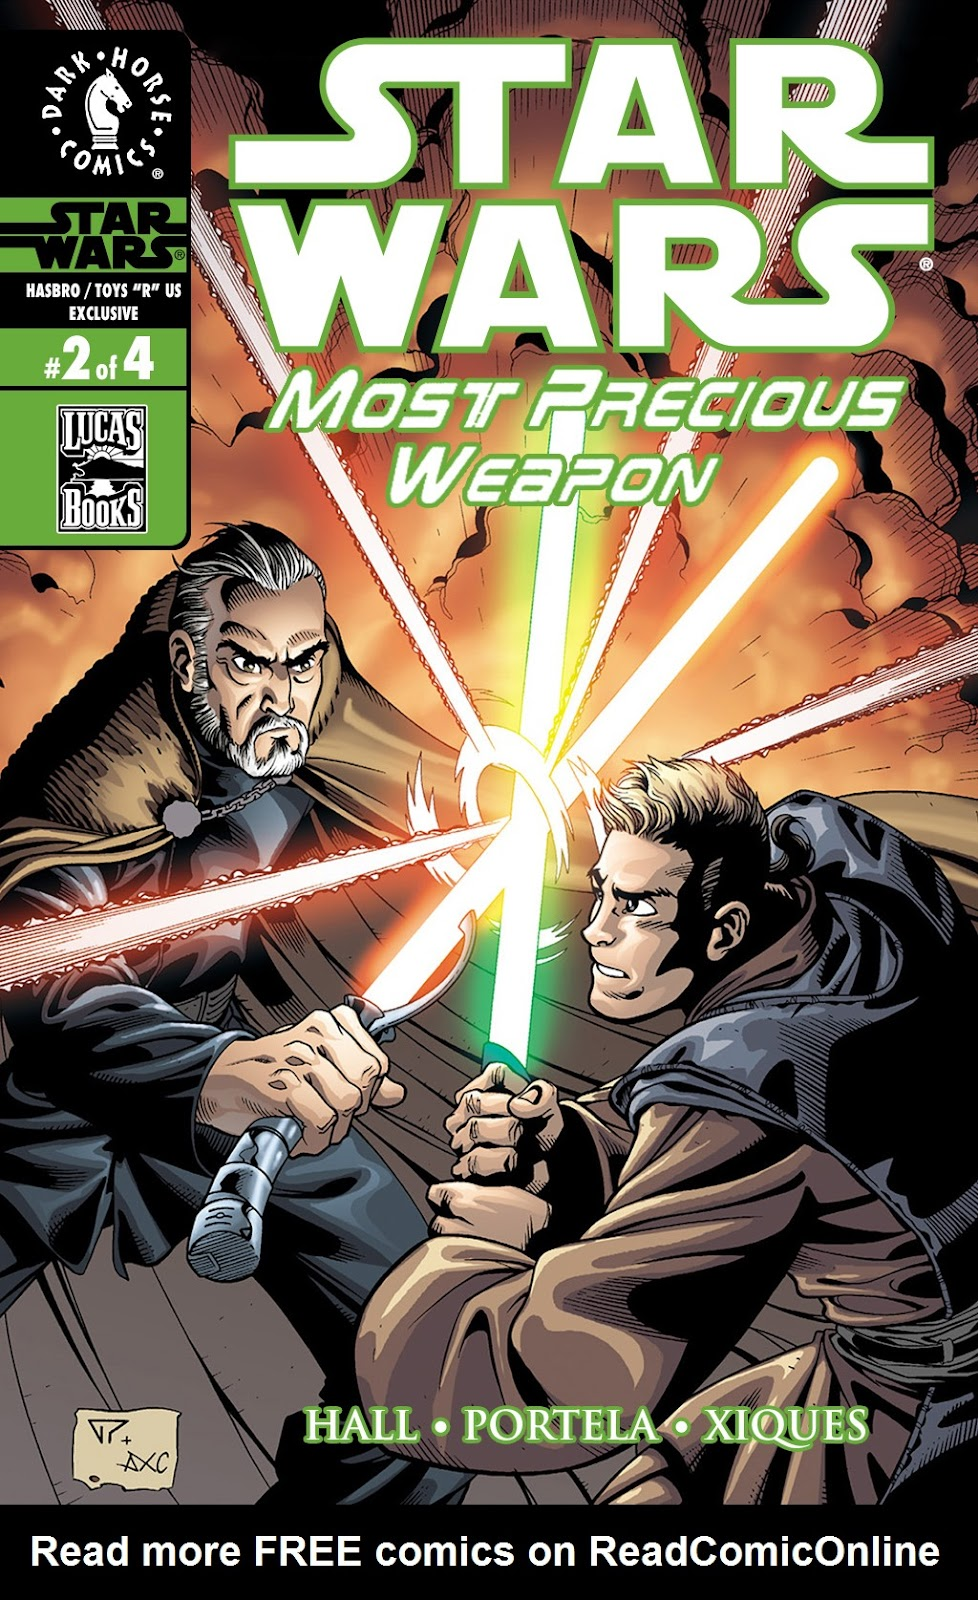 Star Wars: Hasbro/Toys R Us Exclusive 2 Page 1